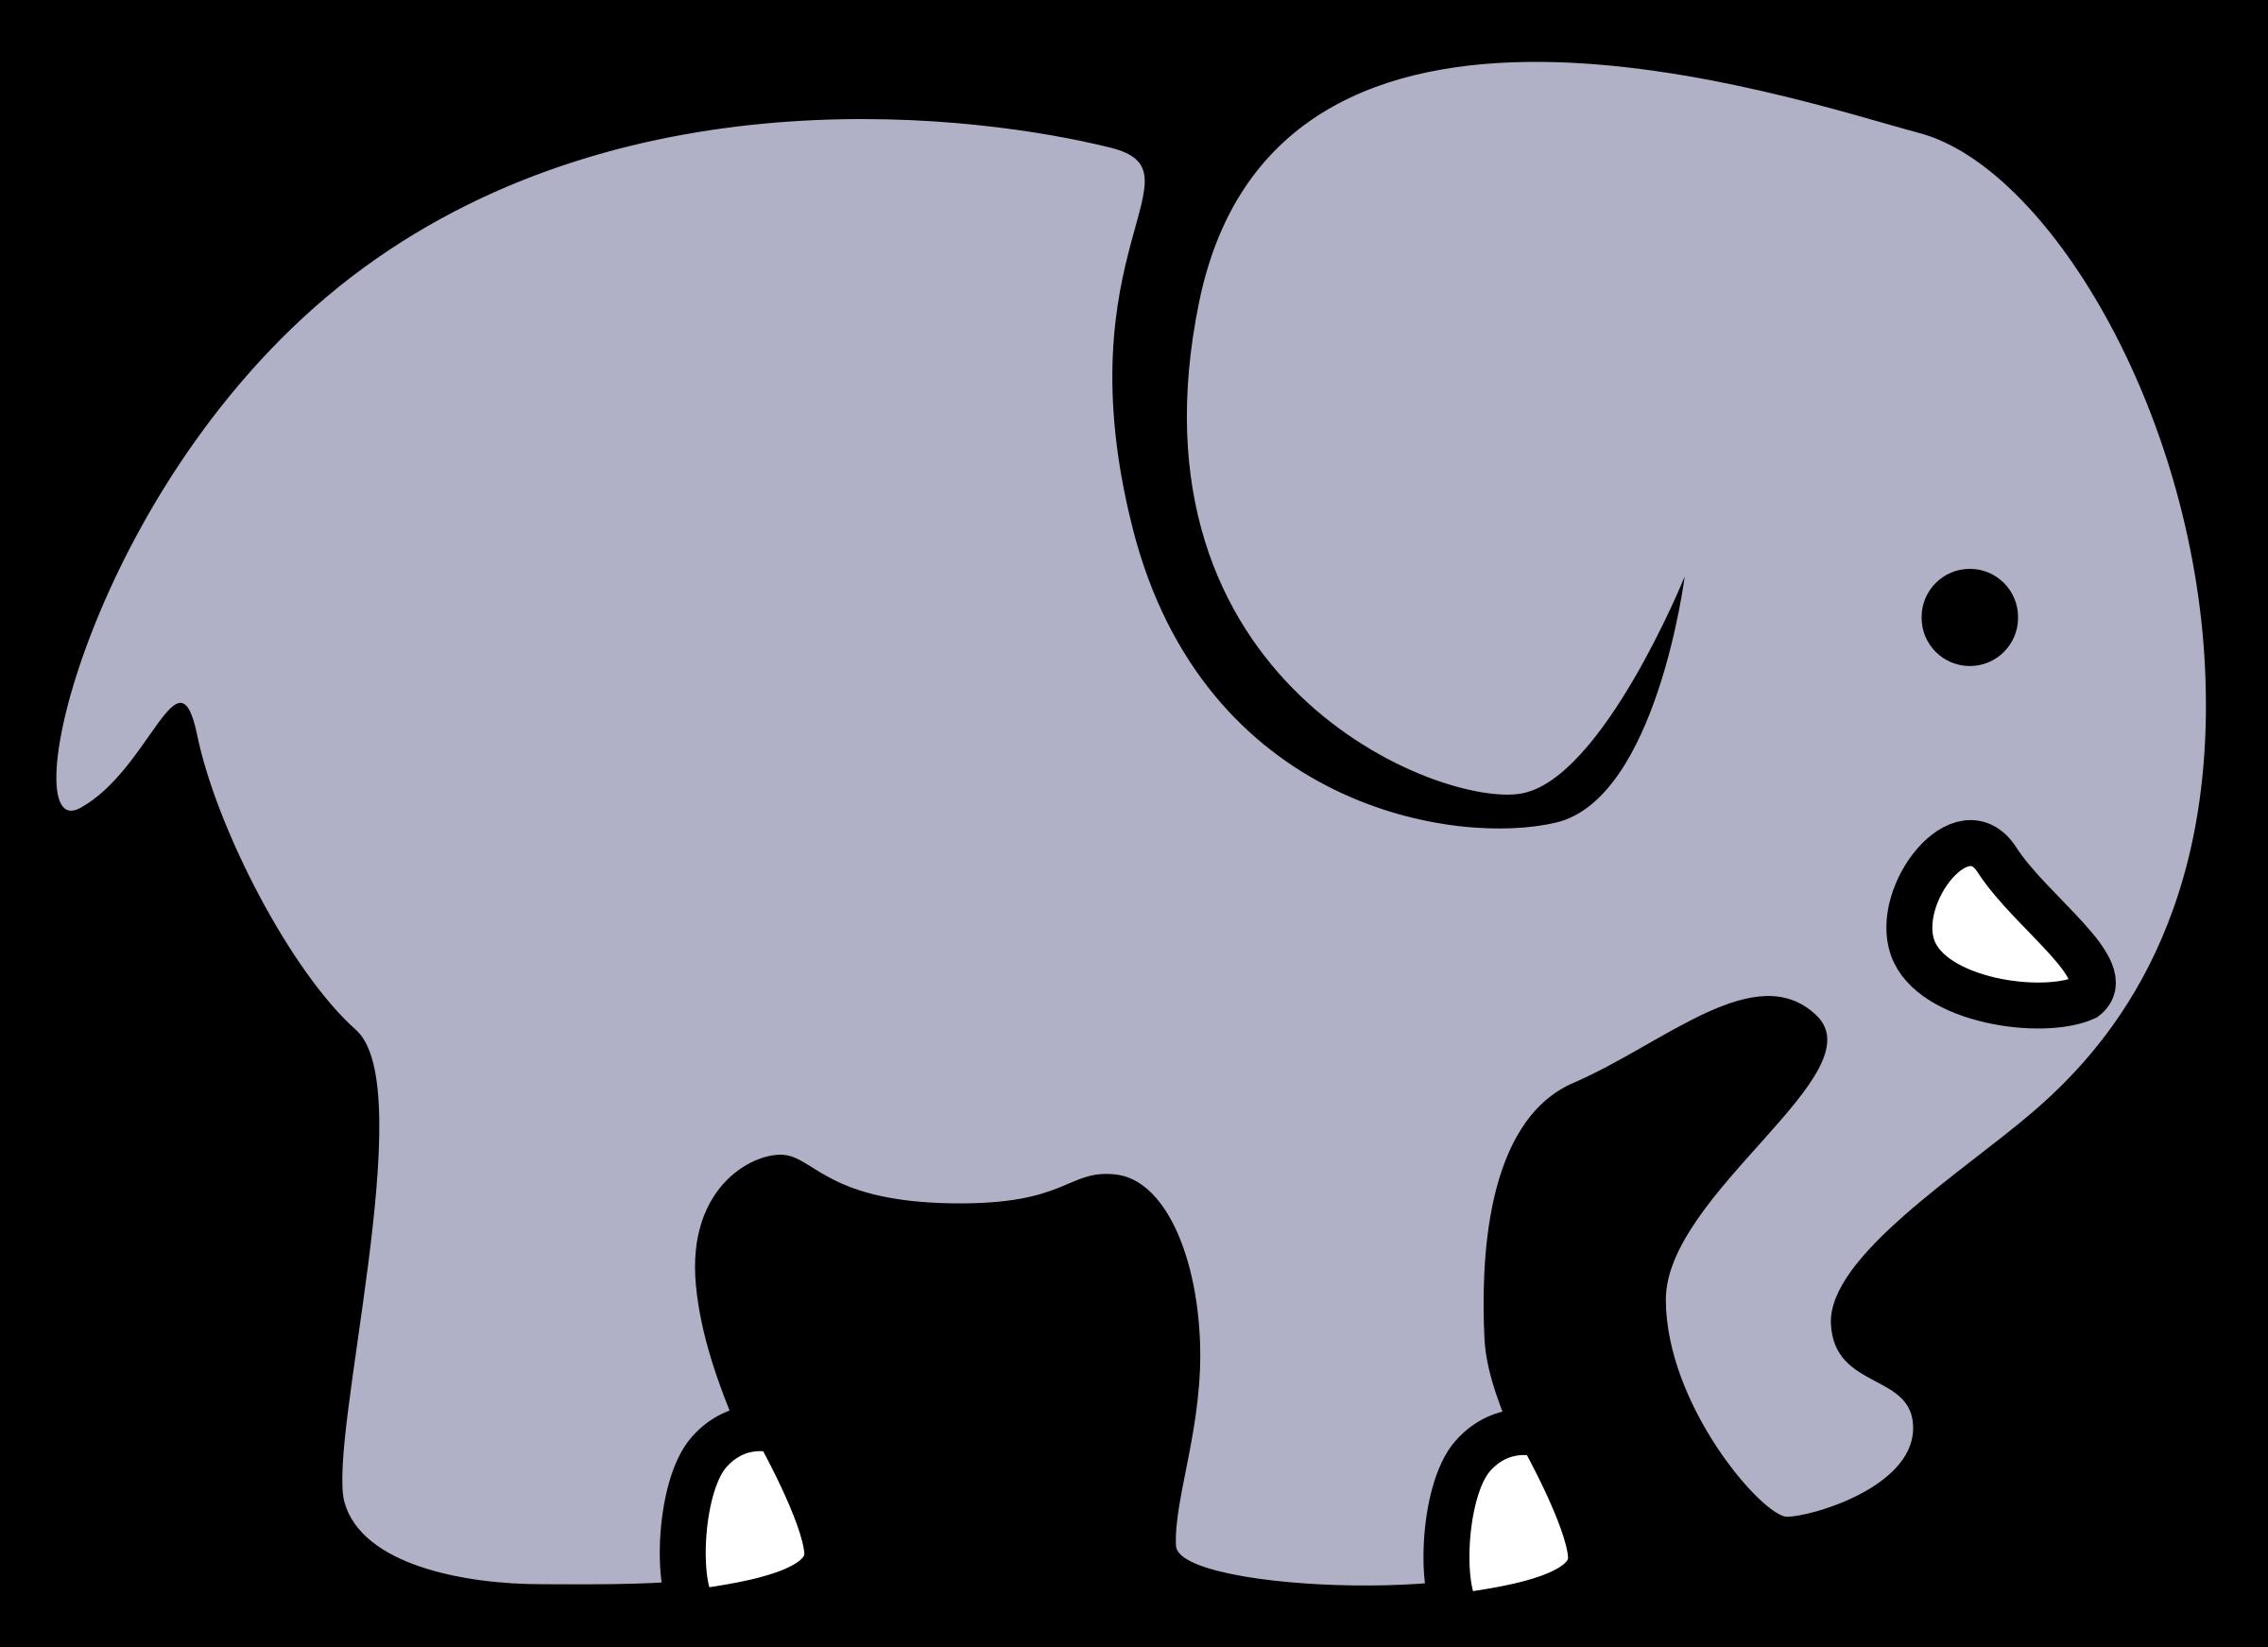 Transparent jpeg elephant clipart clip art black and white download Elephant love transparent background clipart - ClipartFest clip art black and white download